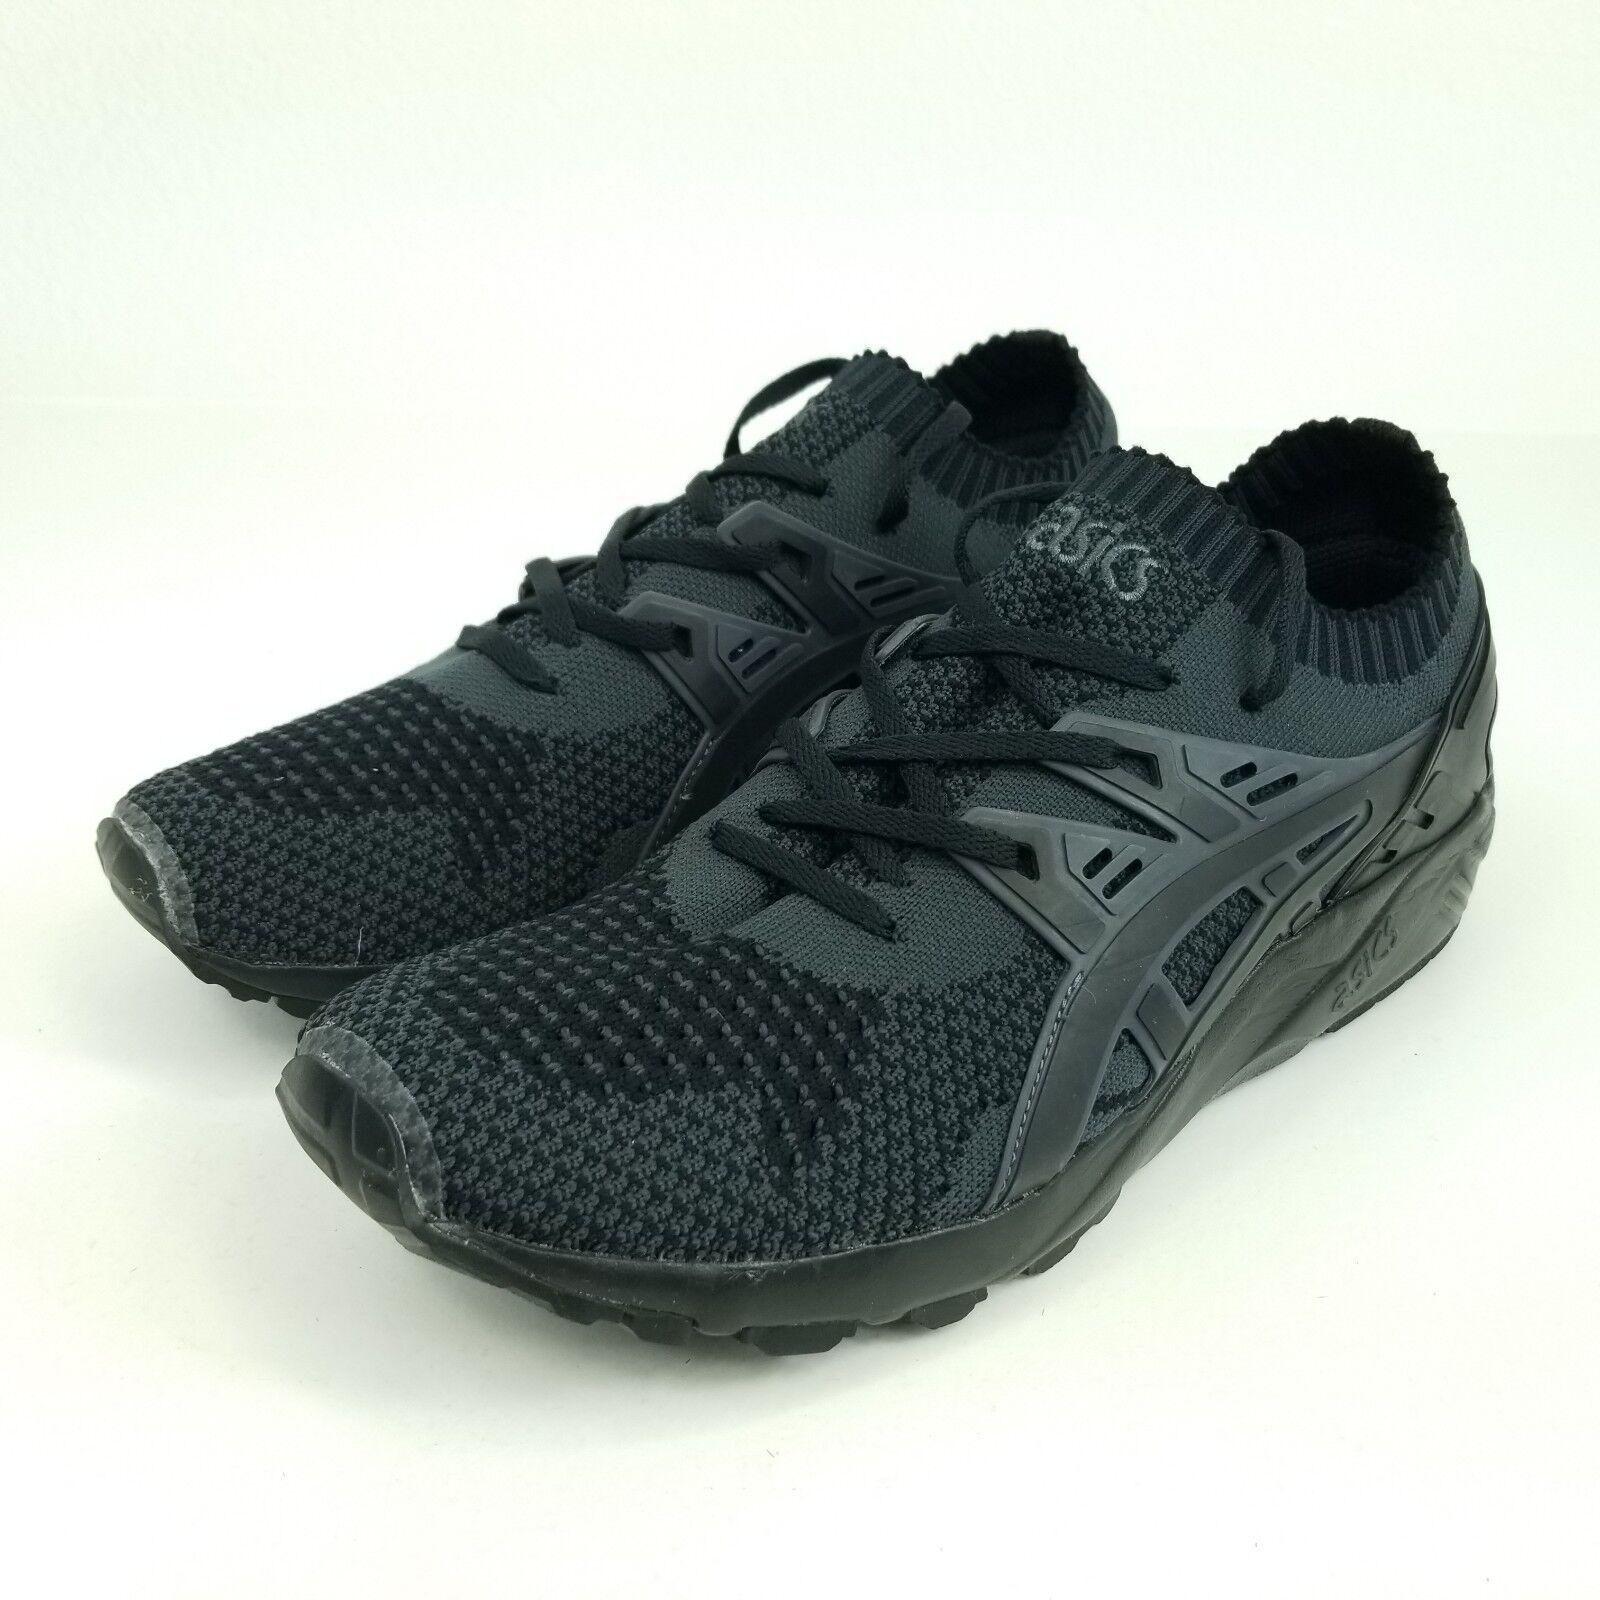 ASICS Gel-Kayano Trainer Knit Mens Sz 11 Shoes Dark Grey/Black H705N.9590